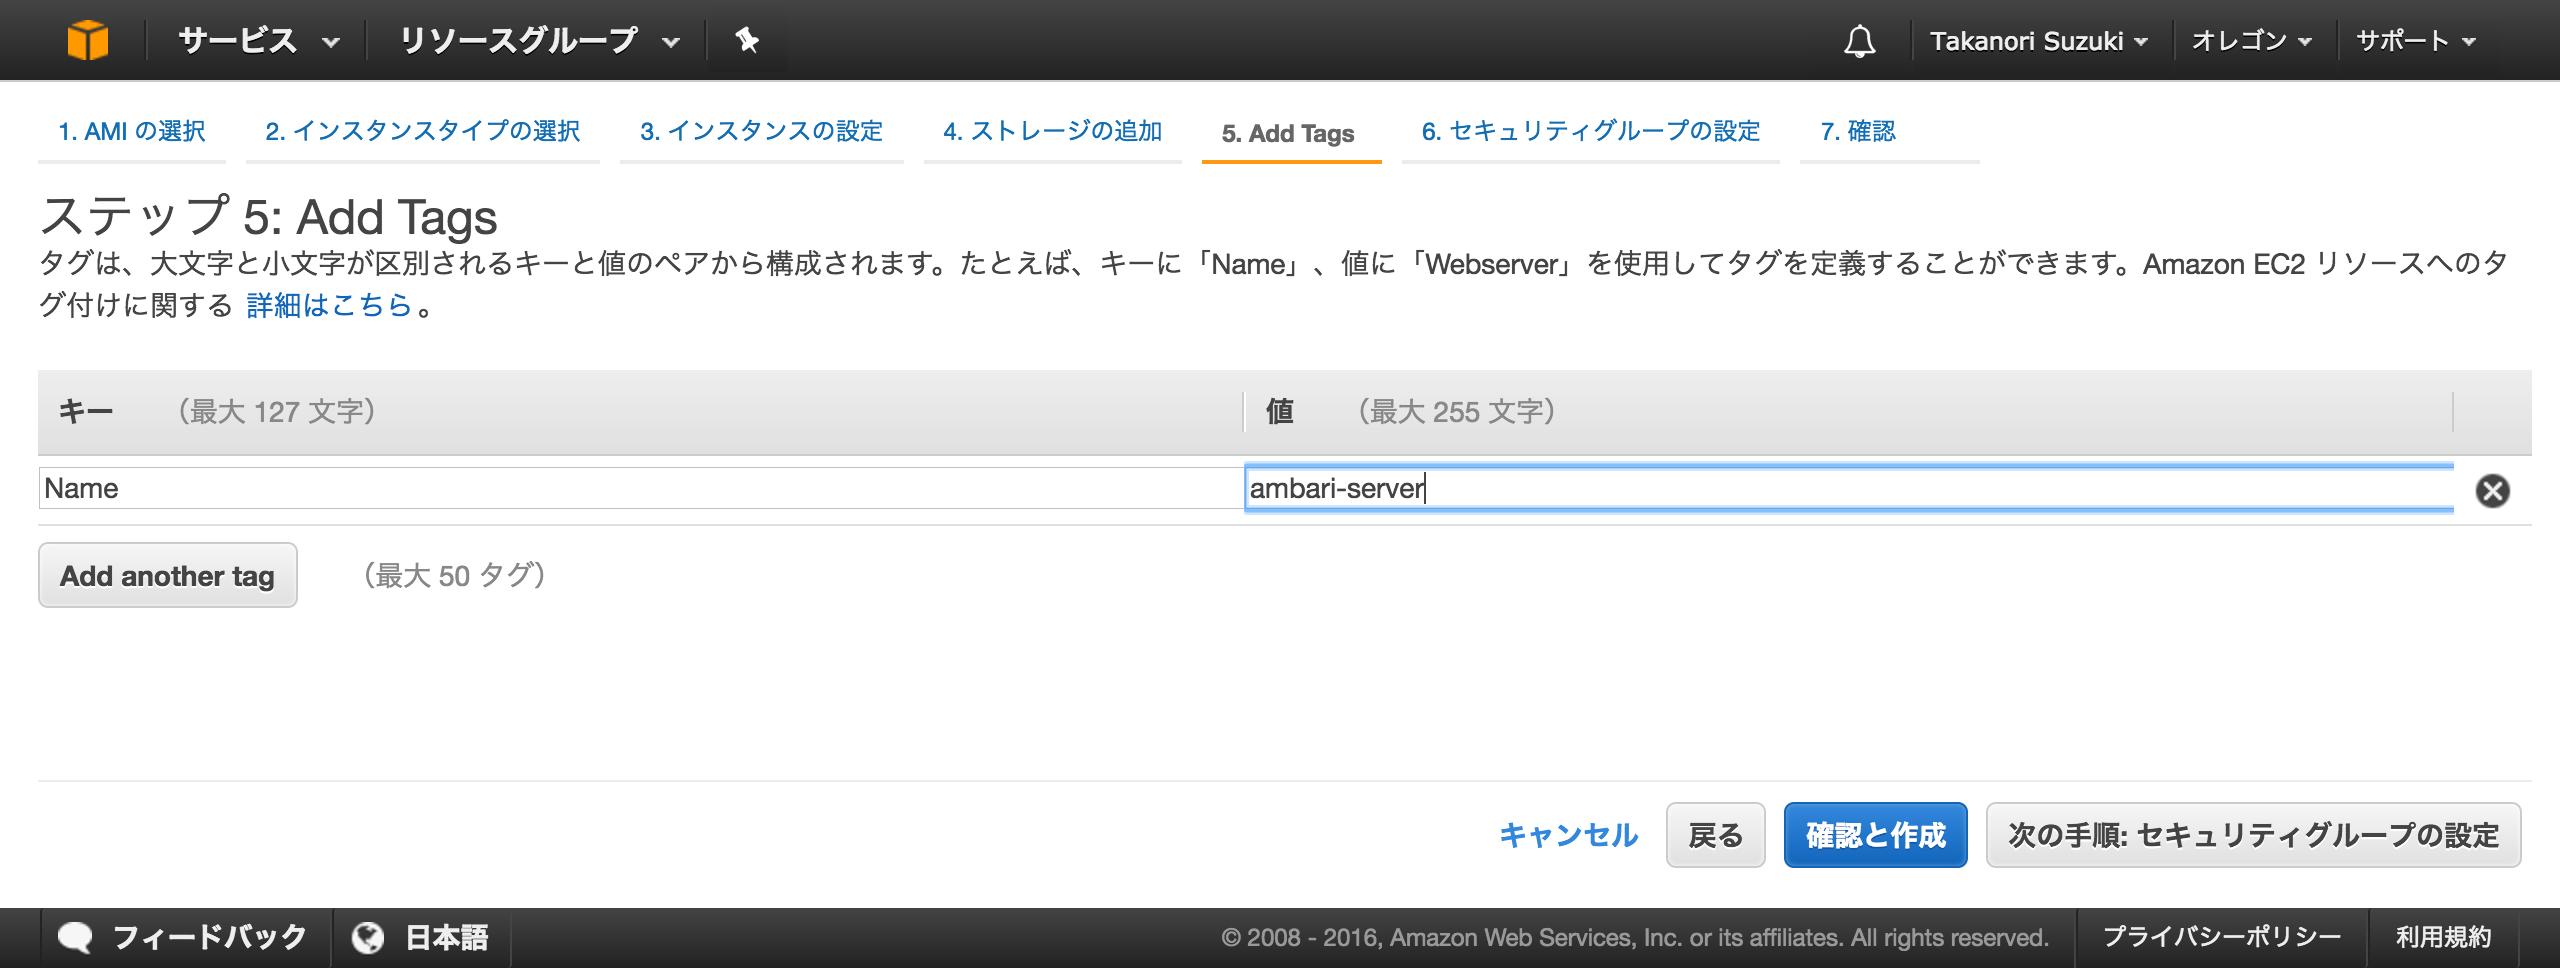 ambari-instance05.png